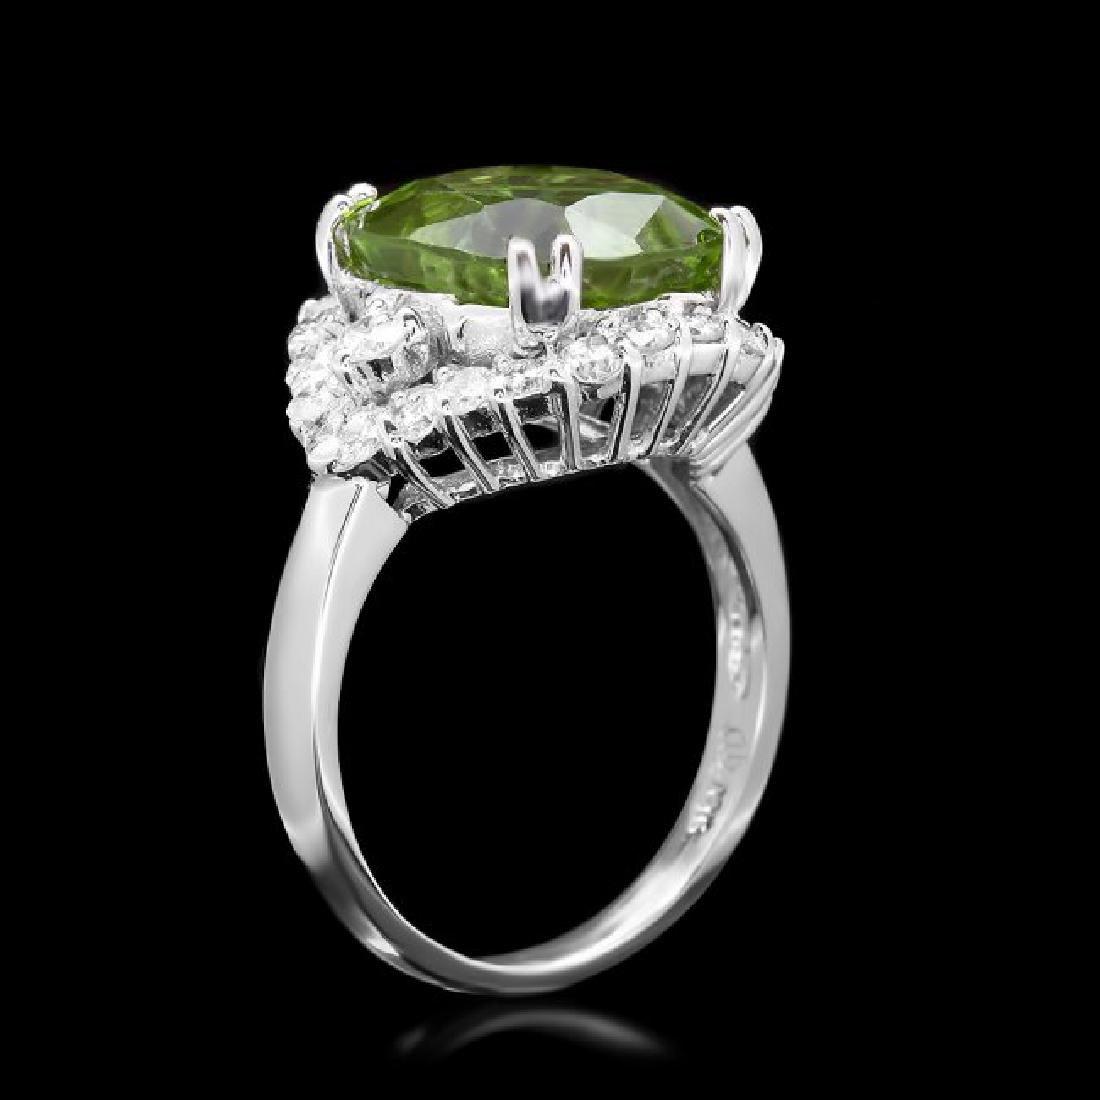 14k White Gold 7.50ct Peridot 1.20ct Diamond Ring - 3